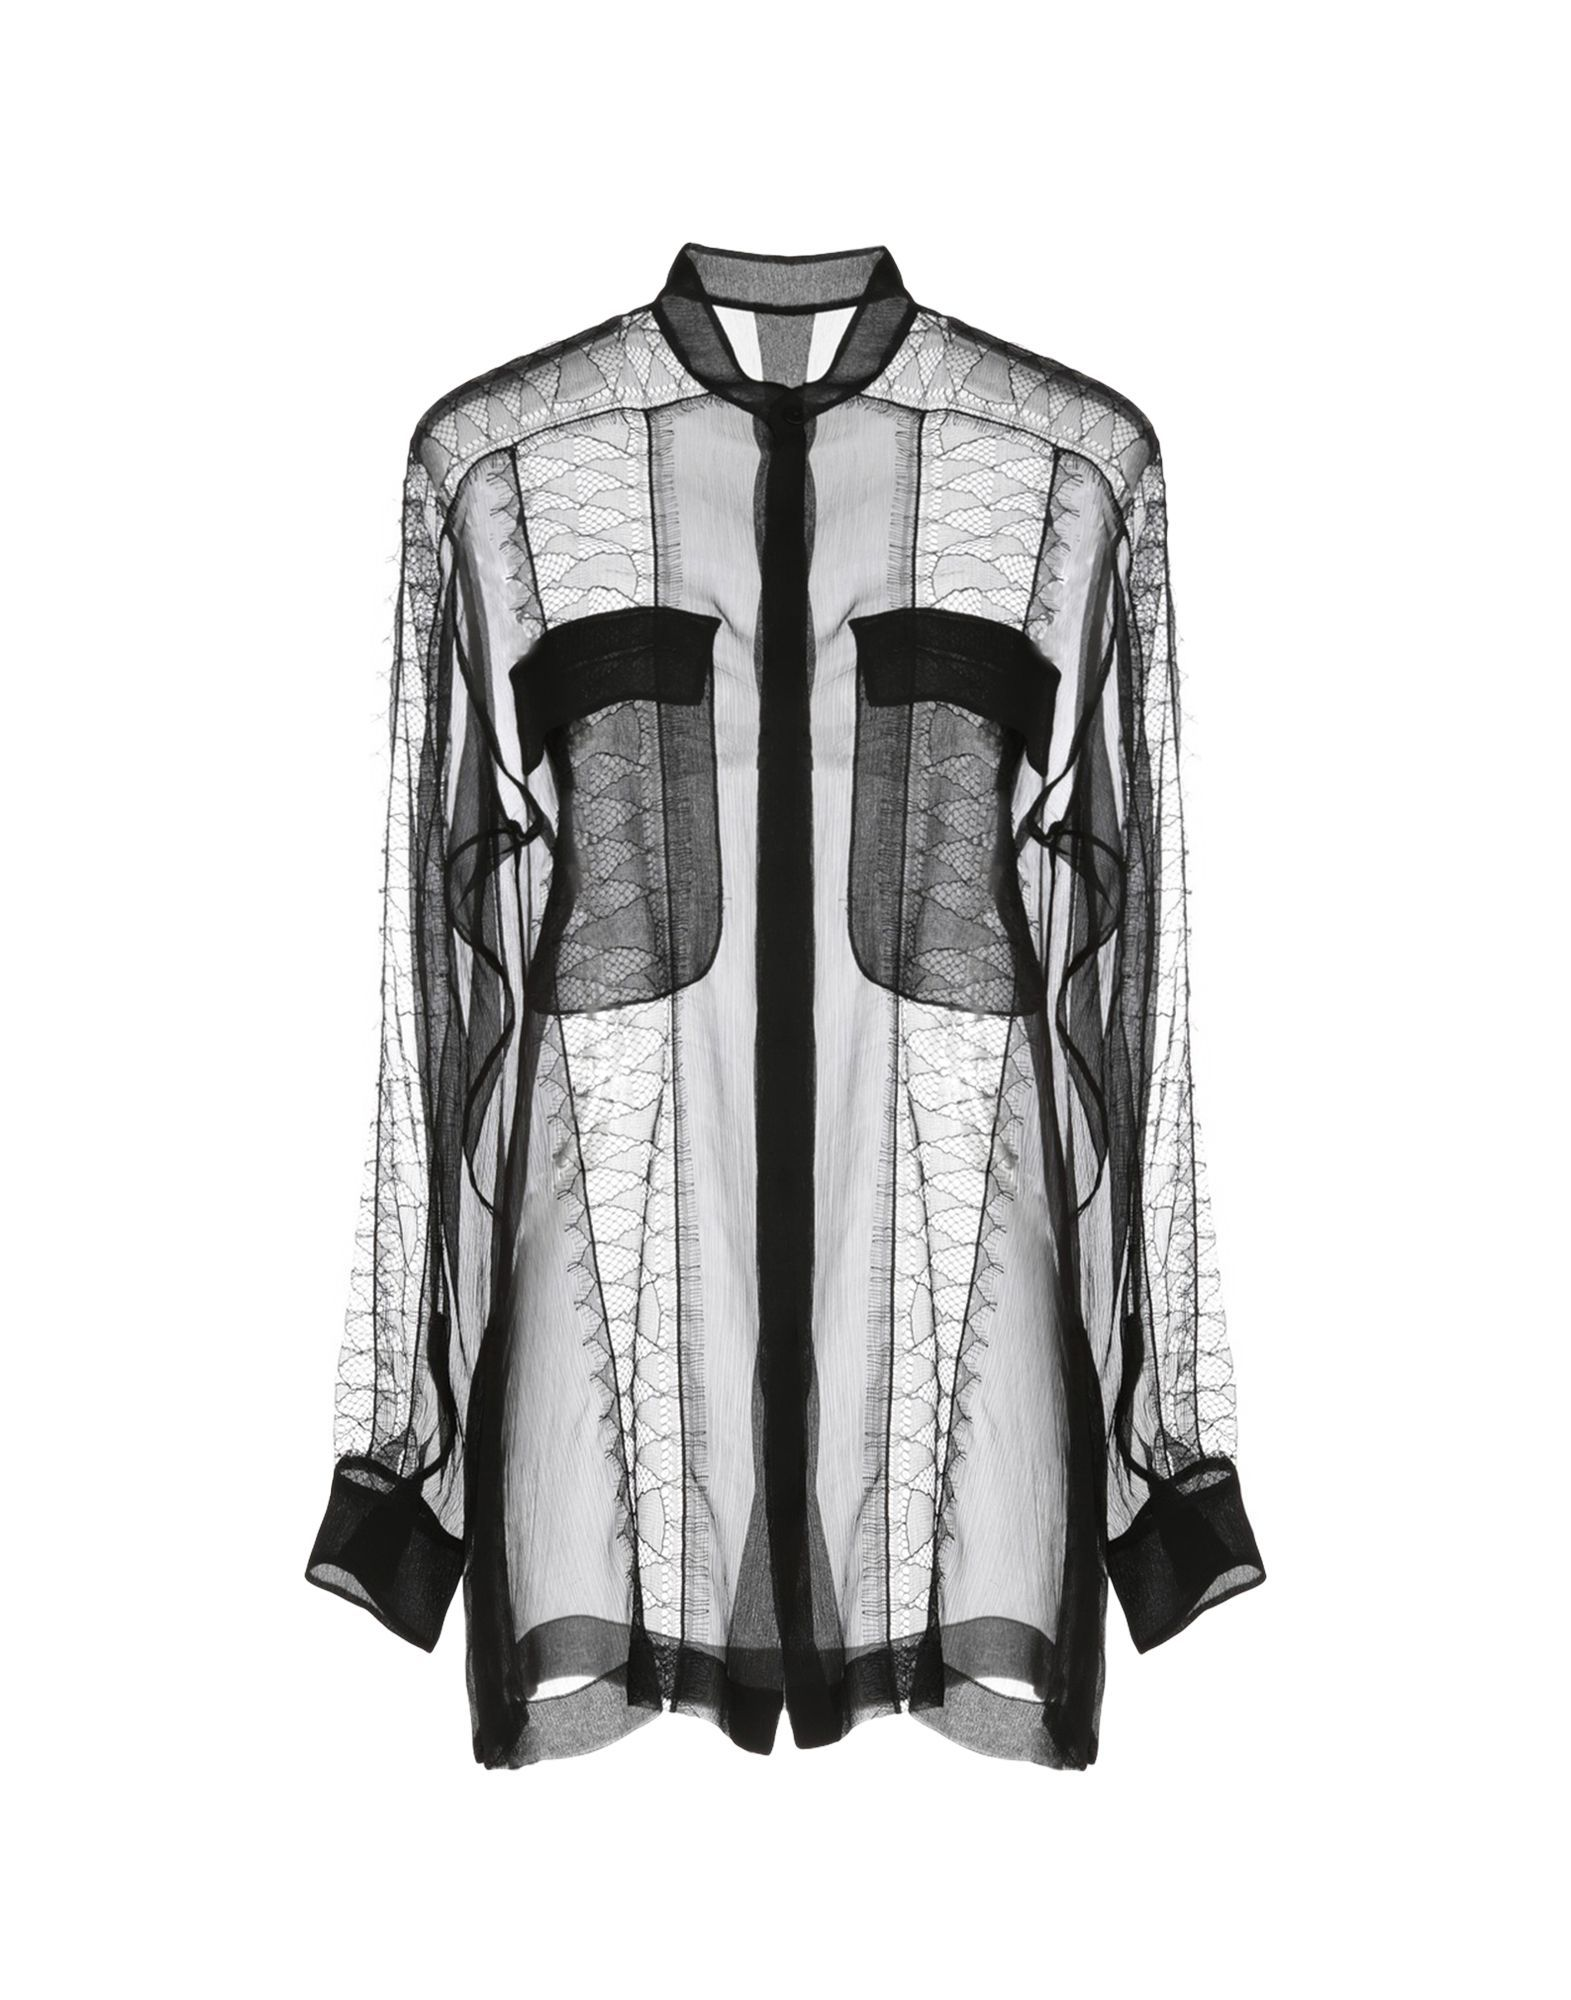 Alberta Ferretti Black Silk Chiffon Shirt